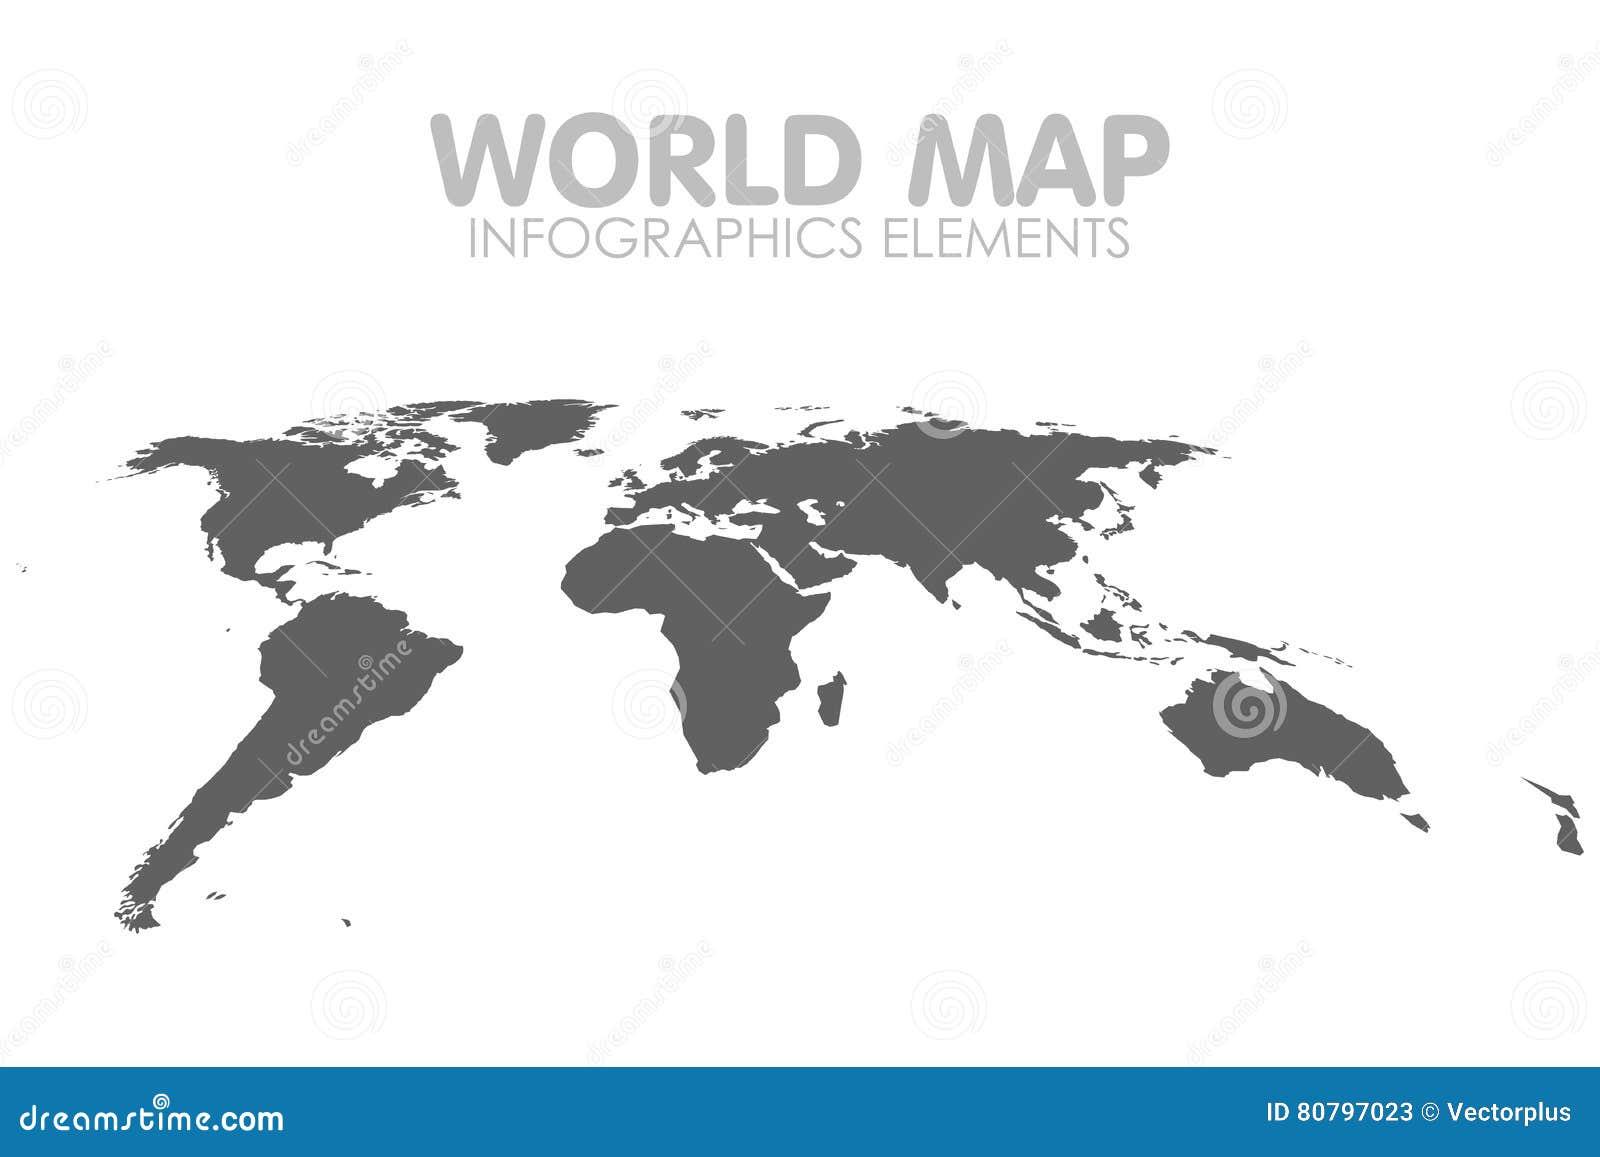 Grey political world map vector aisl el ejemplo stock de grey political world map vector aisl el ejemplo gumiabroncs Choice Image